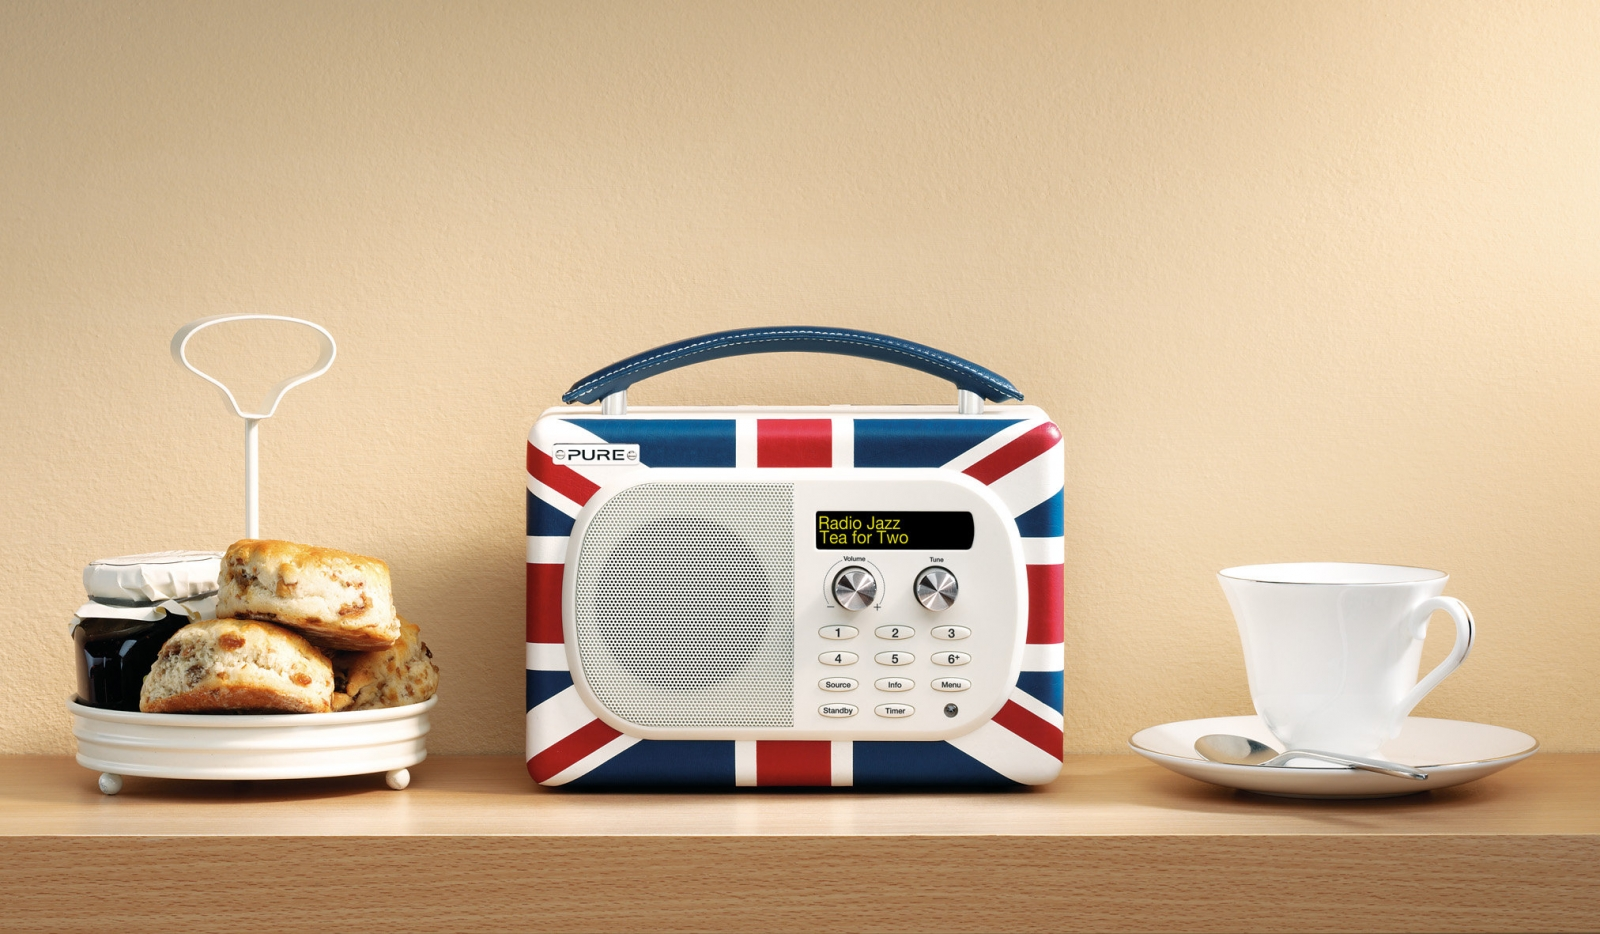 Pure Evoke Mio Portable DAB Digital/FM Radio